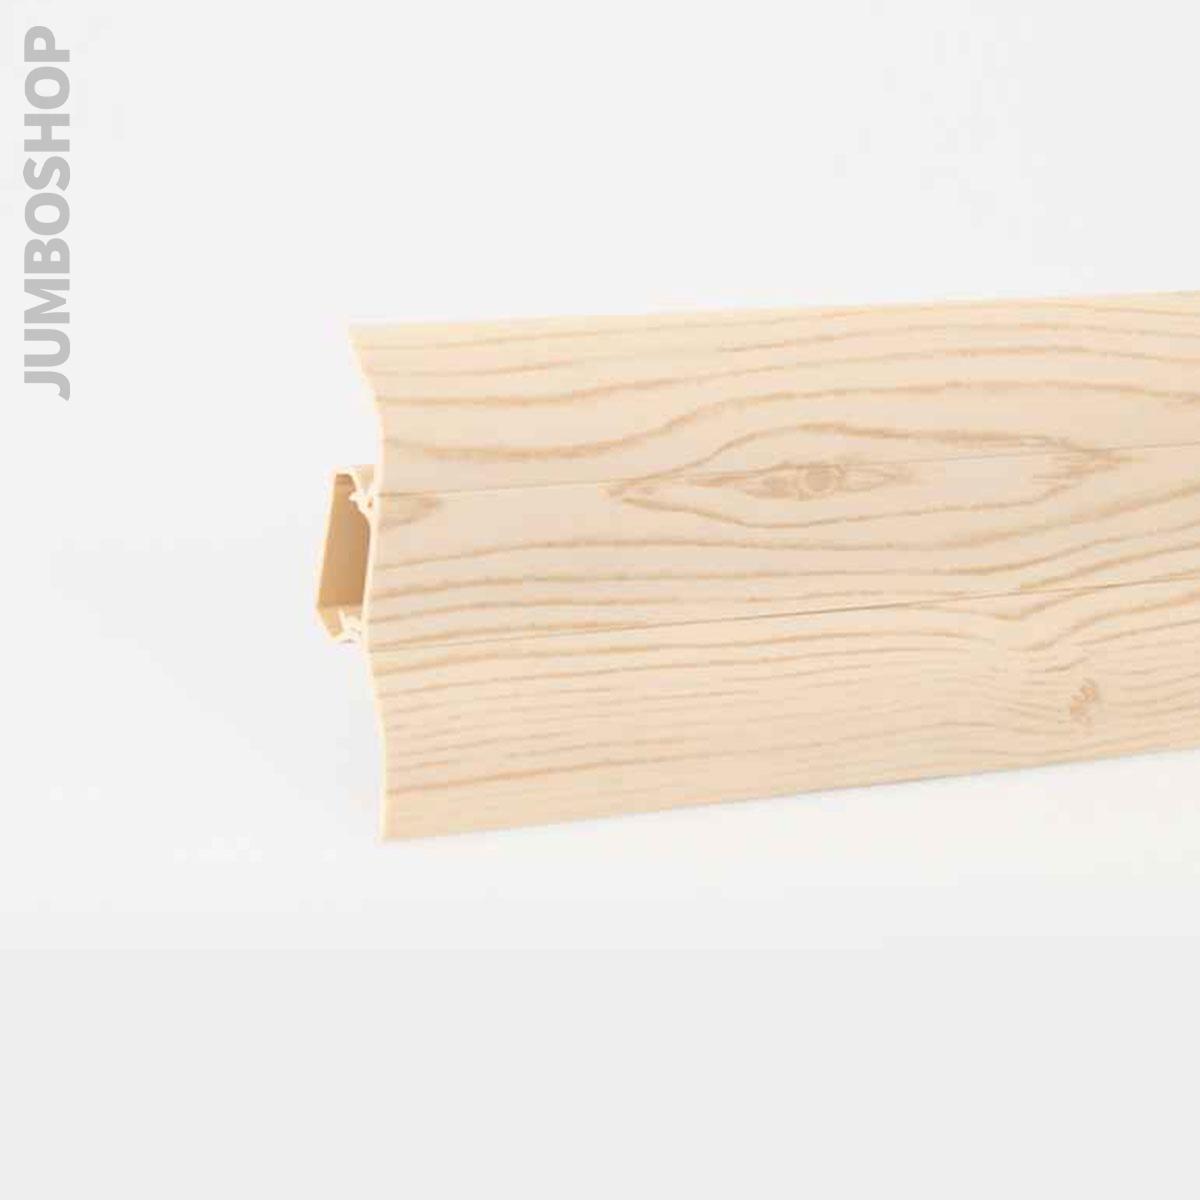 sockelleisten 2 5m fussleisten aus kunststoff mit kabelkanal gummilippen top ebay. Black Bedroom Furniture Sets. Home Design Ideas